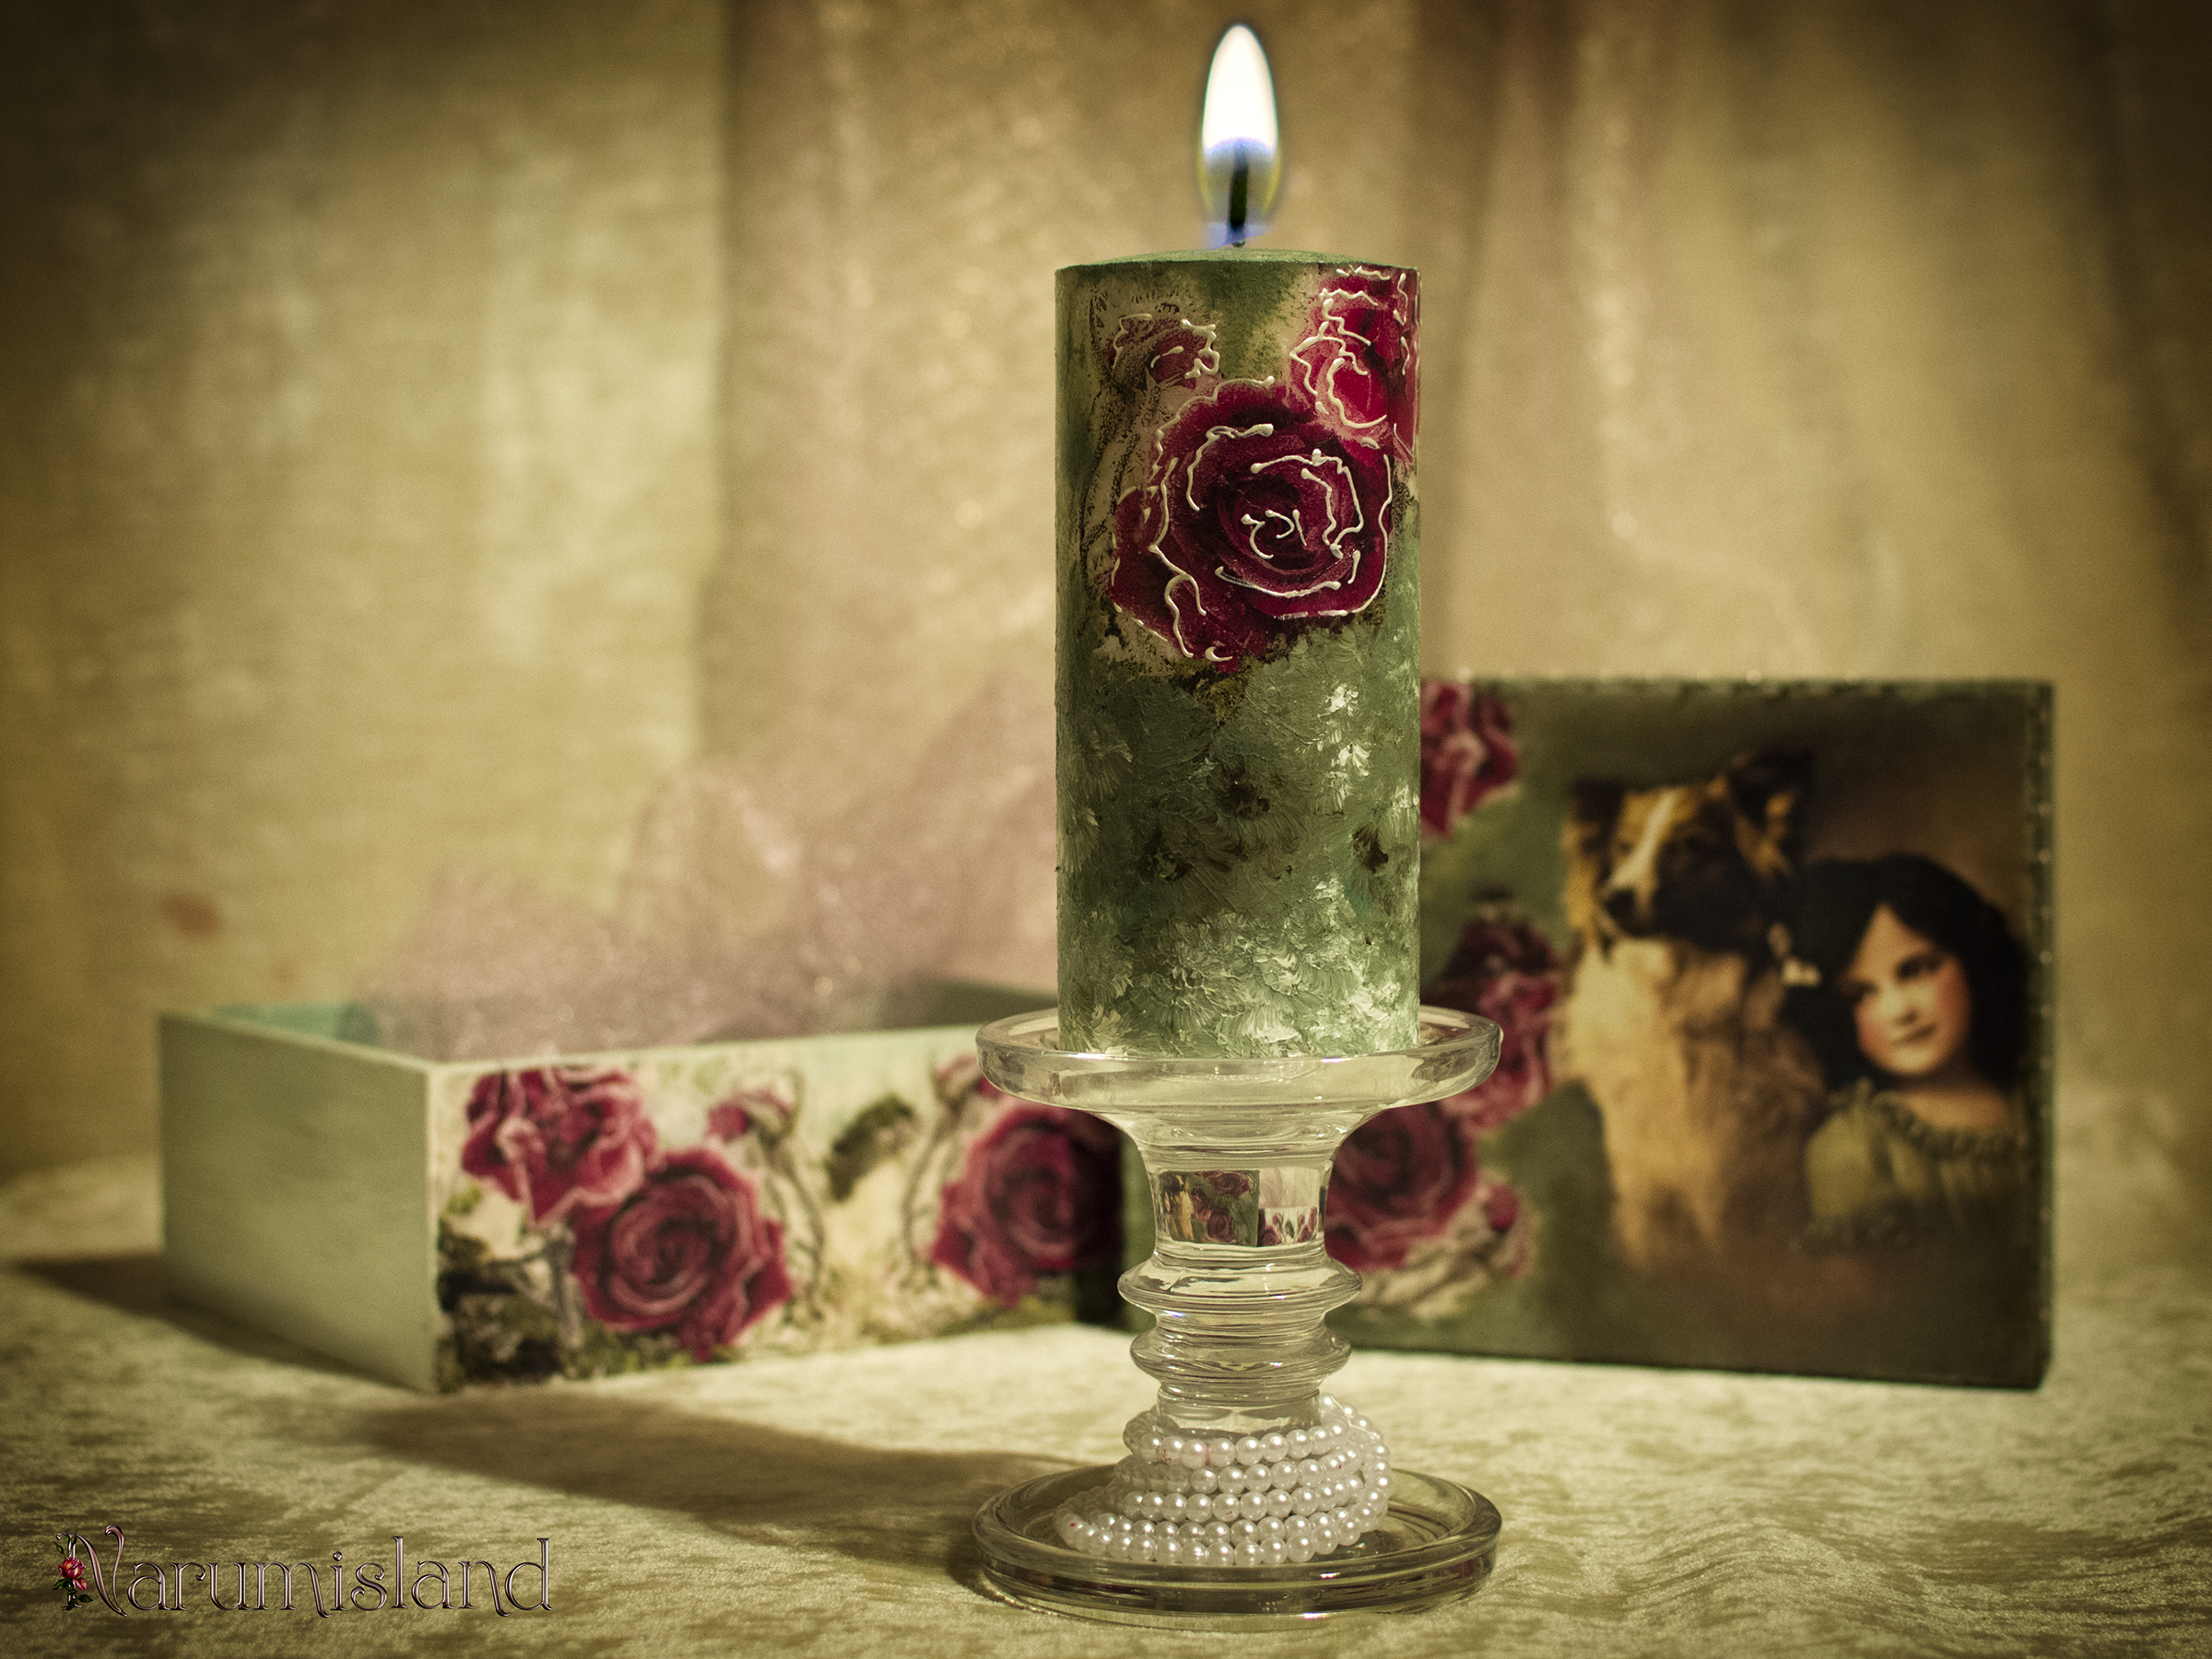 Lumanare decorativa cu trandafiri, in tonuri de verde si kaki_foto1